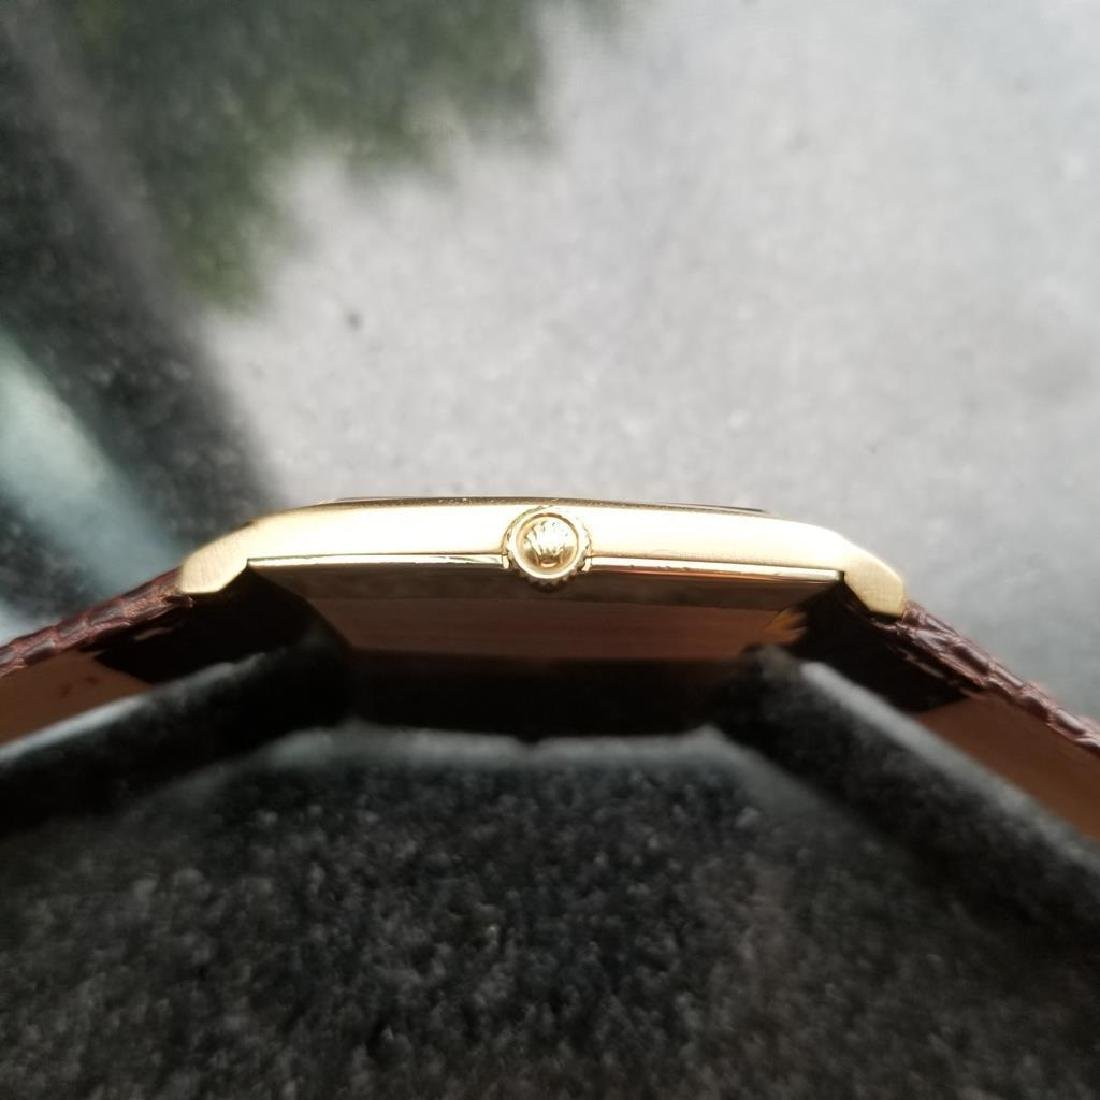 ROLEX Men's 18K Gold Cellini 4136 Hand-Wind Dress Watch - 5